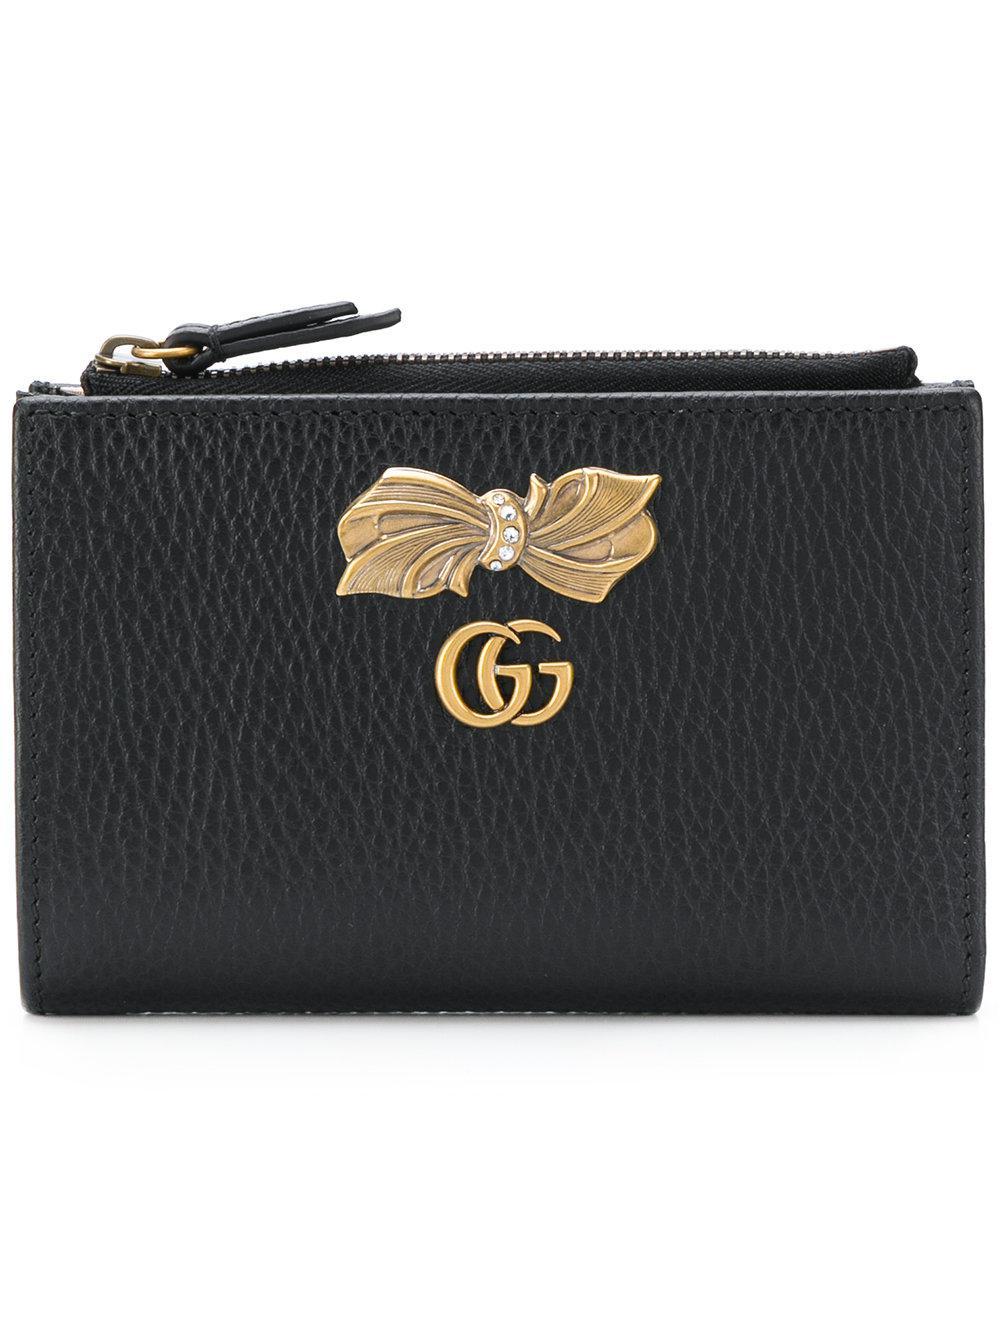 f79fd862e9f6 Gucci Bow Detail Zip Wallet in Black - Lyst